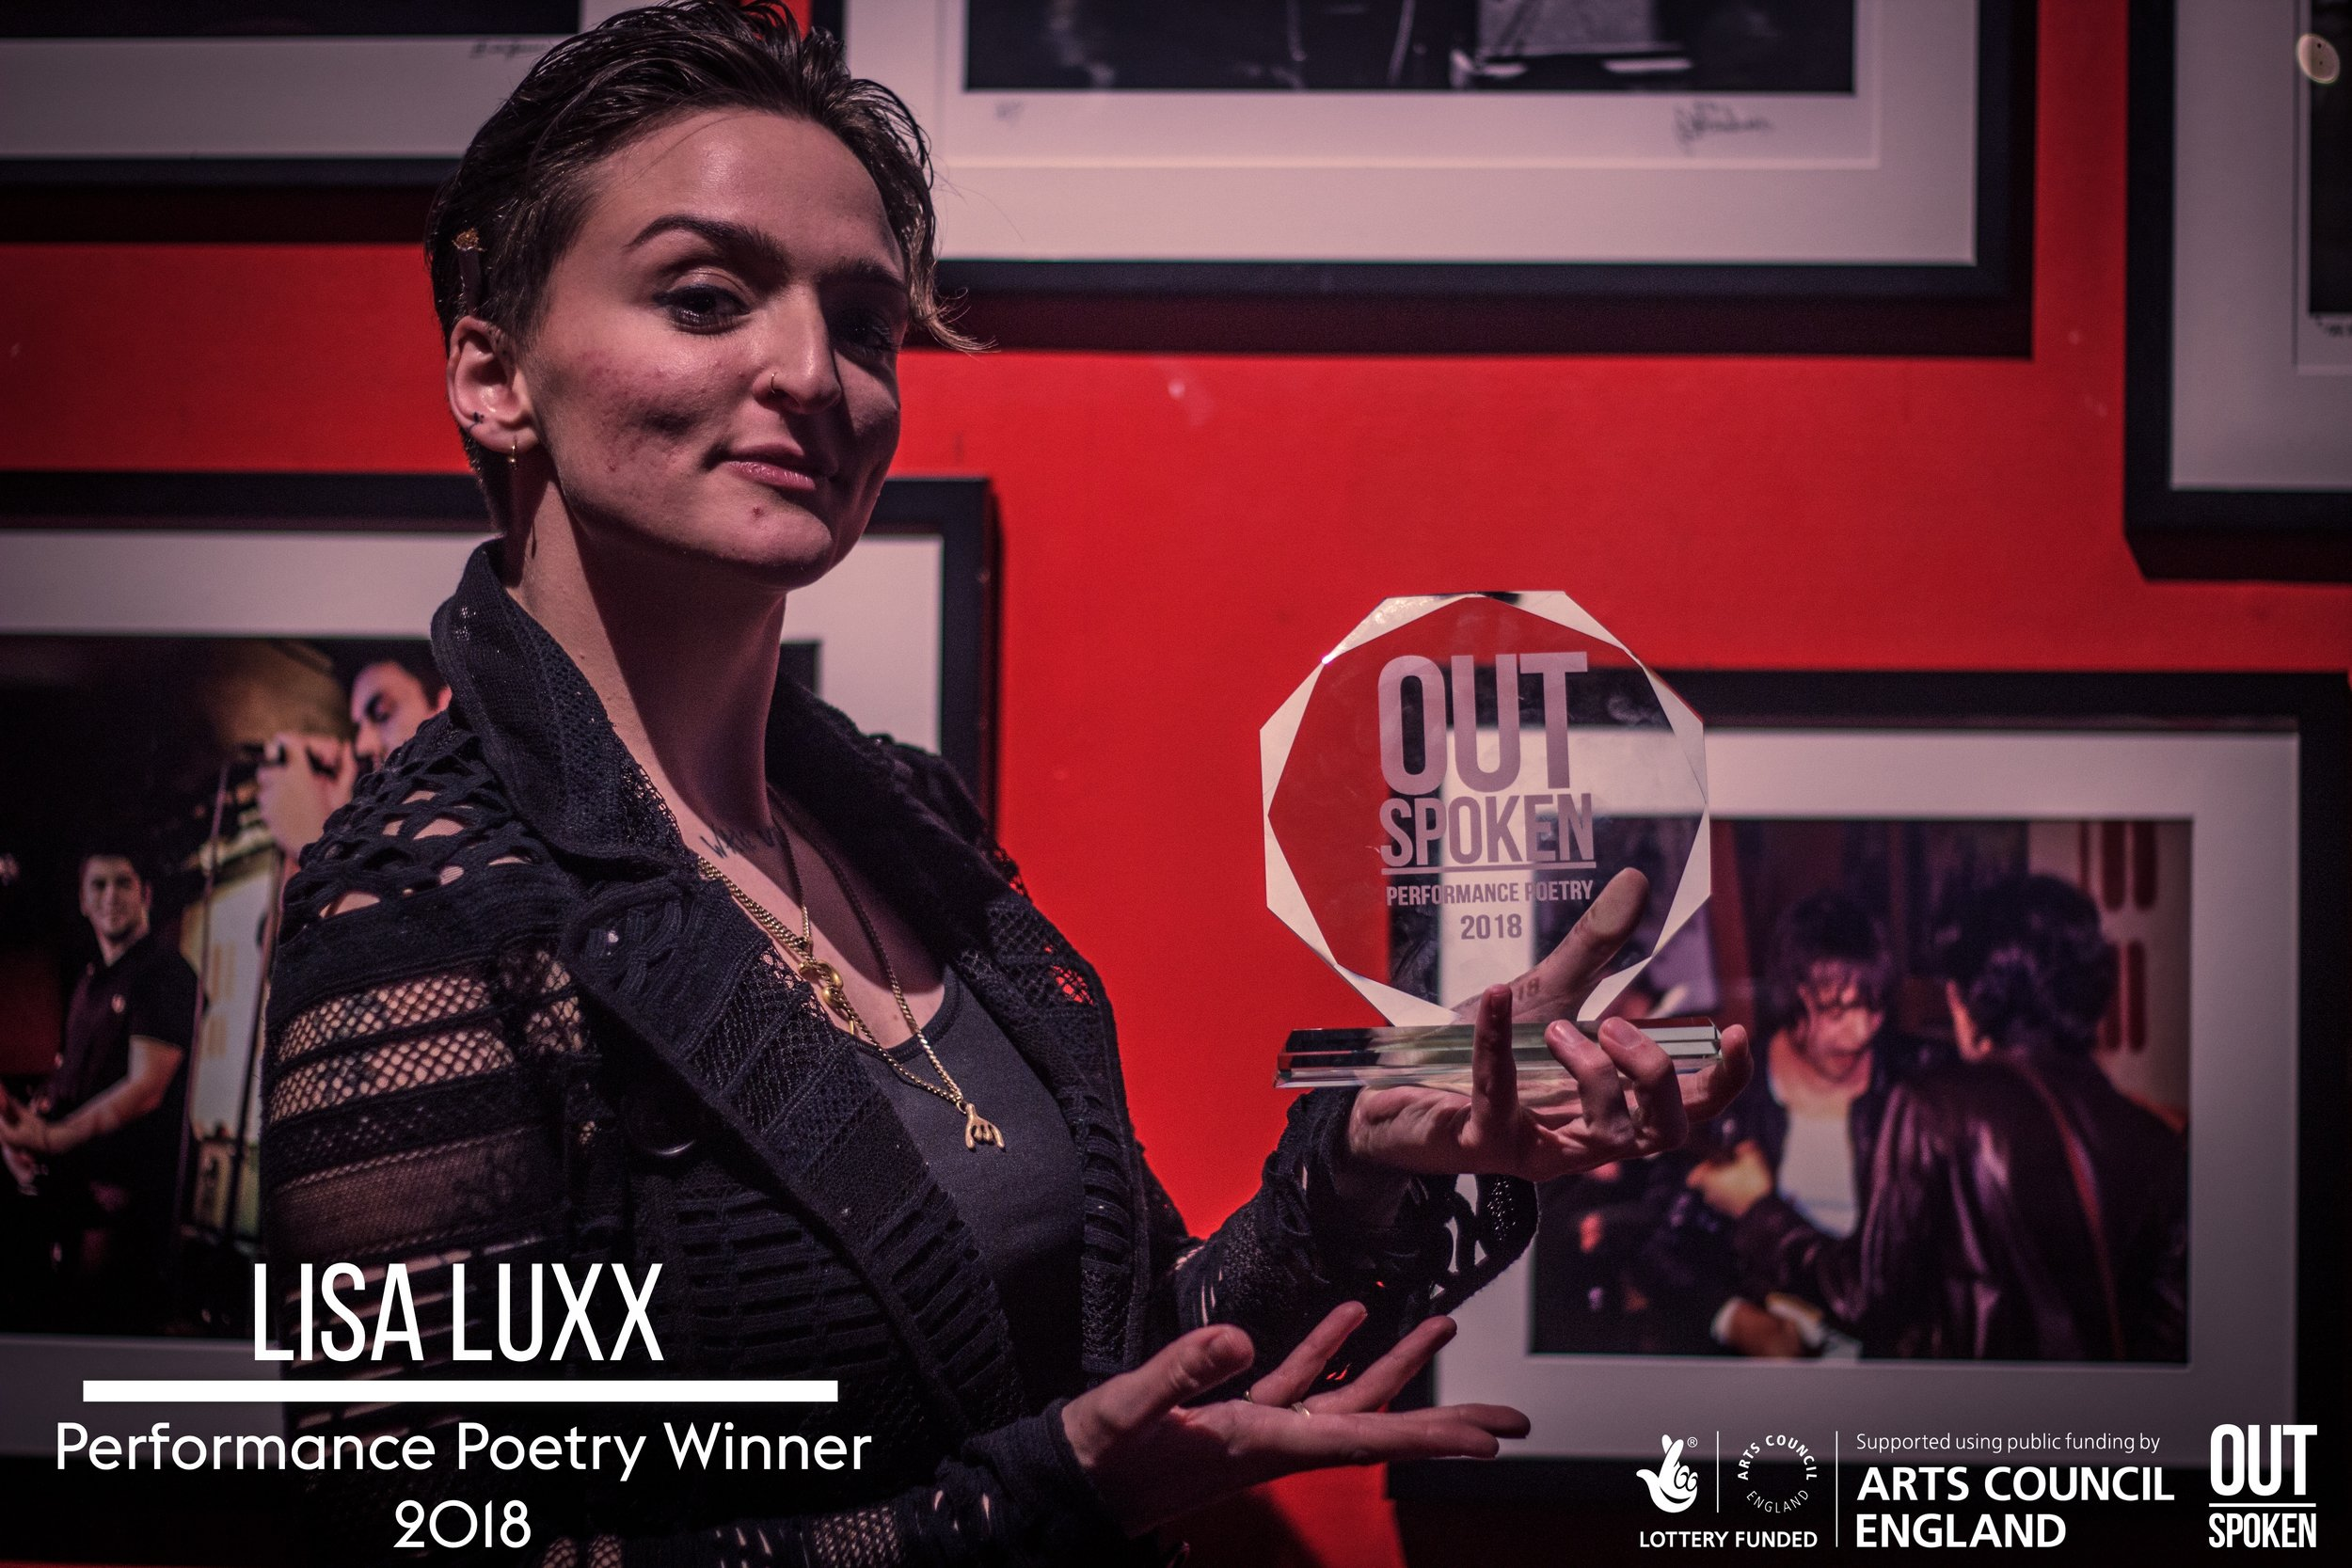 Performance Winner: Lisa Luxx - Click to watch performance